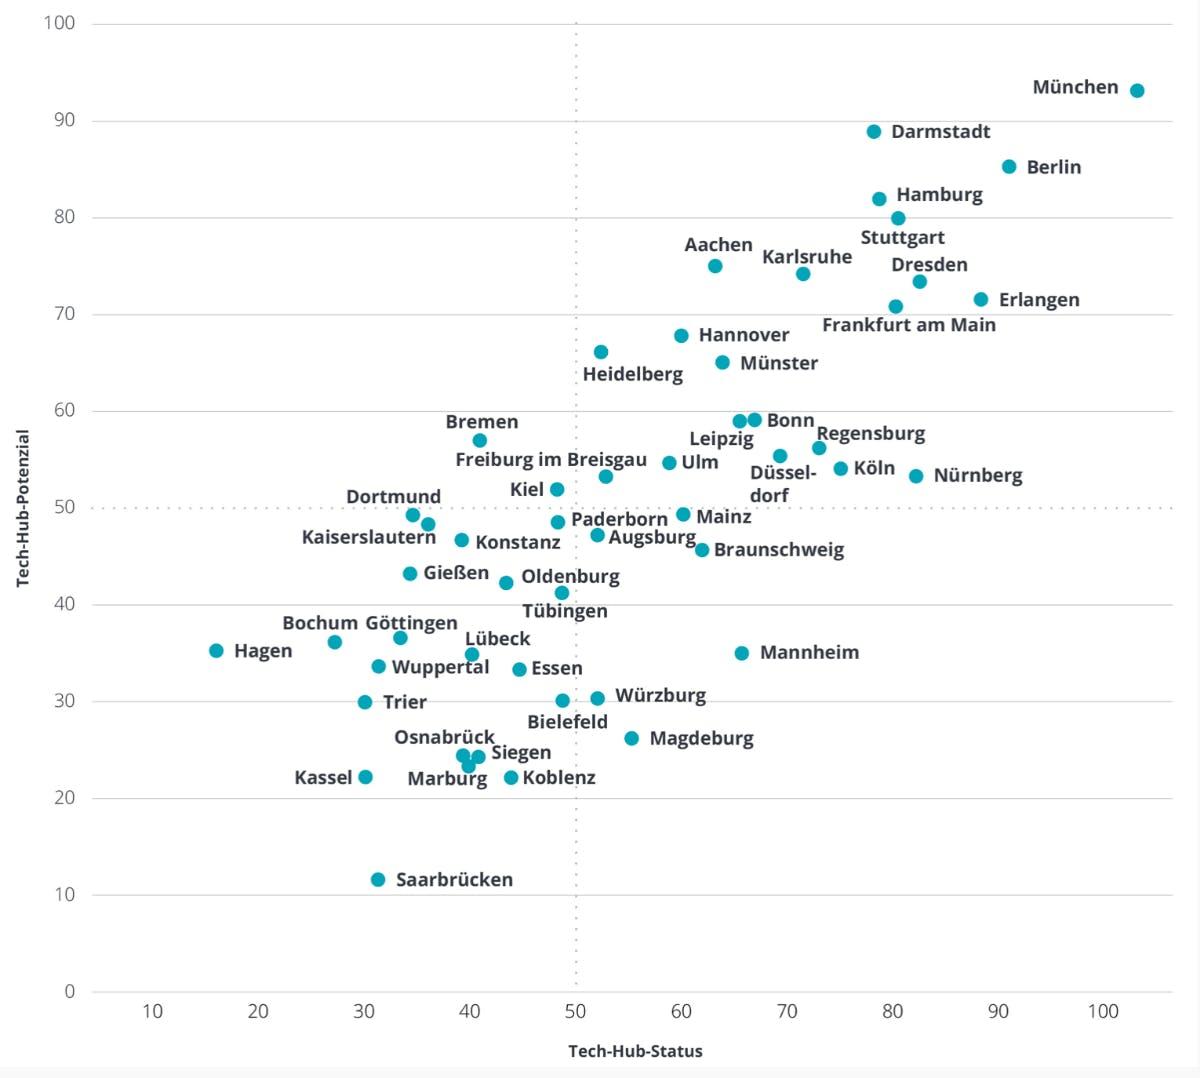 Matrix aus Tech-Hub-Status und Tach-Hub-Potenzial (Grafik: Deloitte)